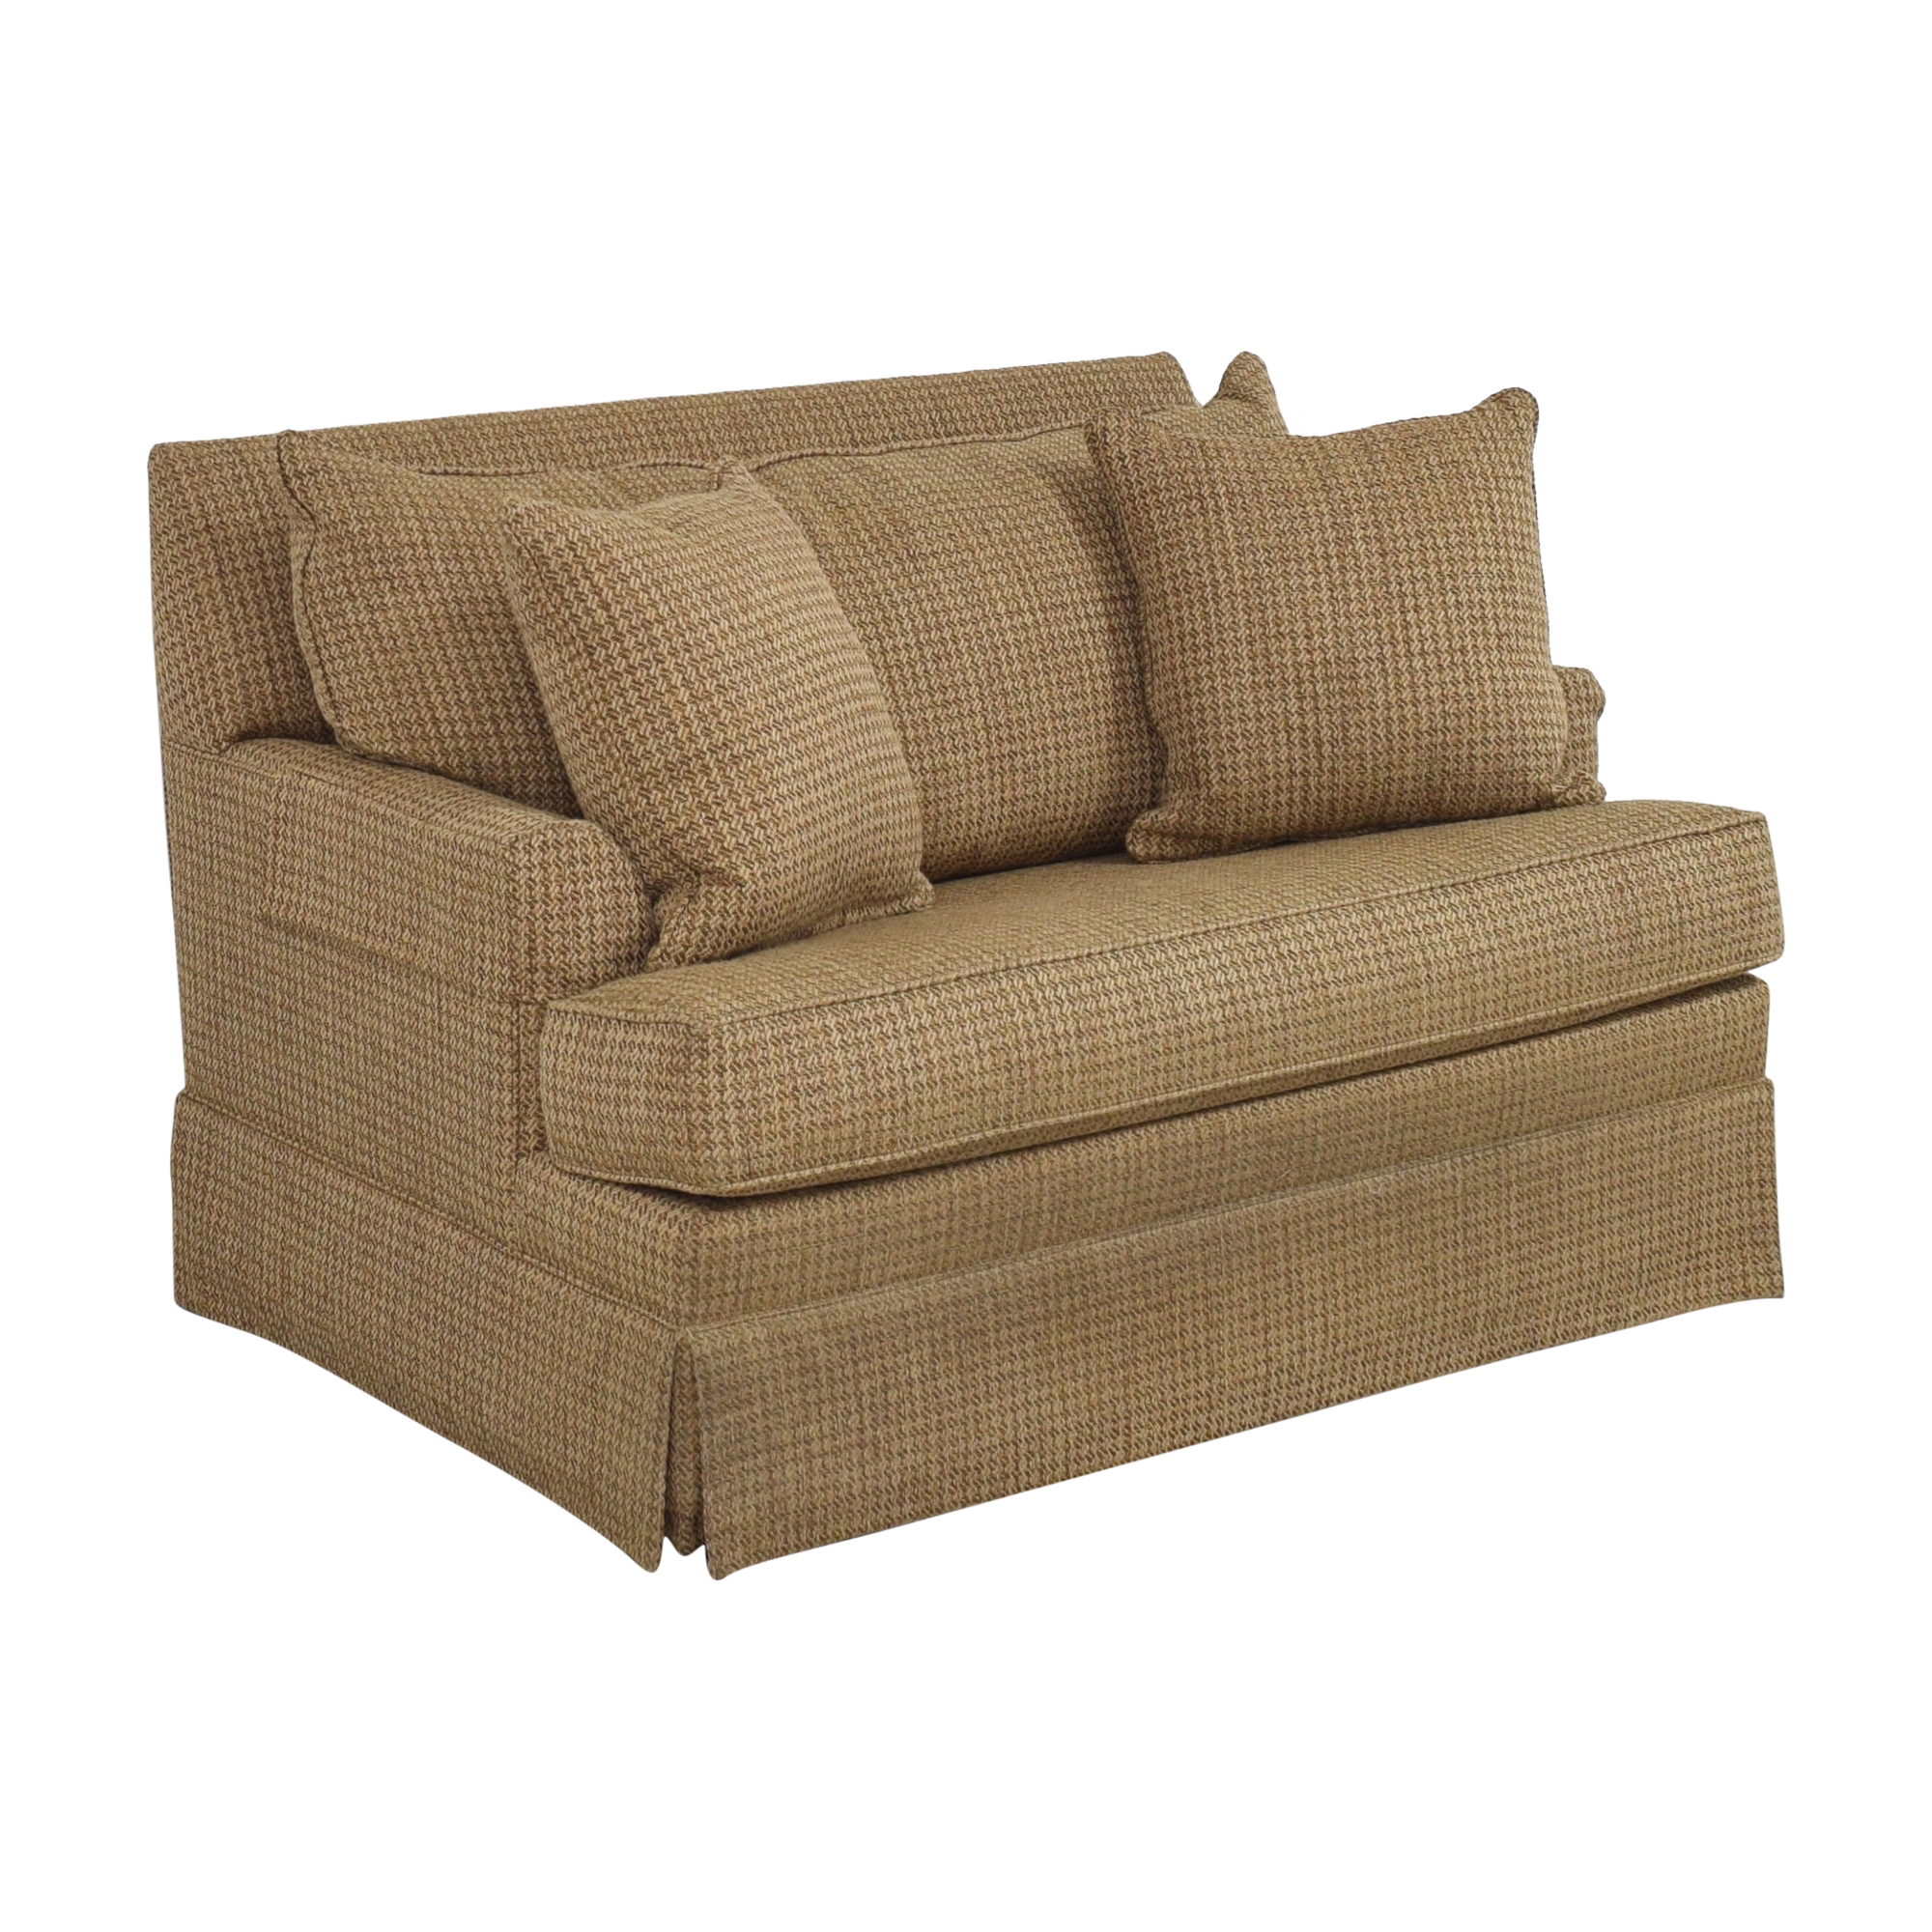 Ethan Allen Ethan Allen Chair and a Half Twin Sleeper coupon